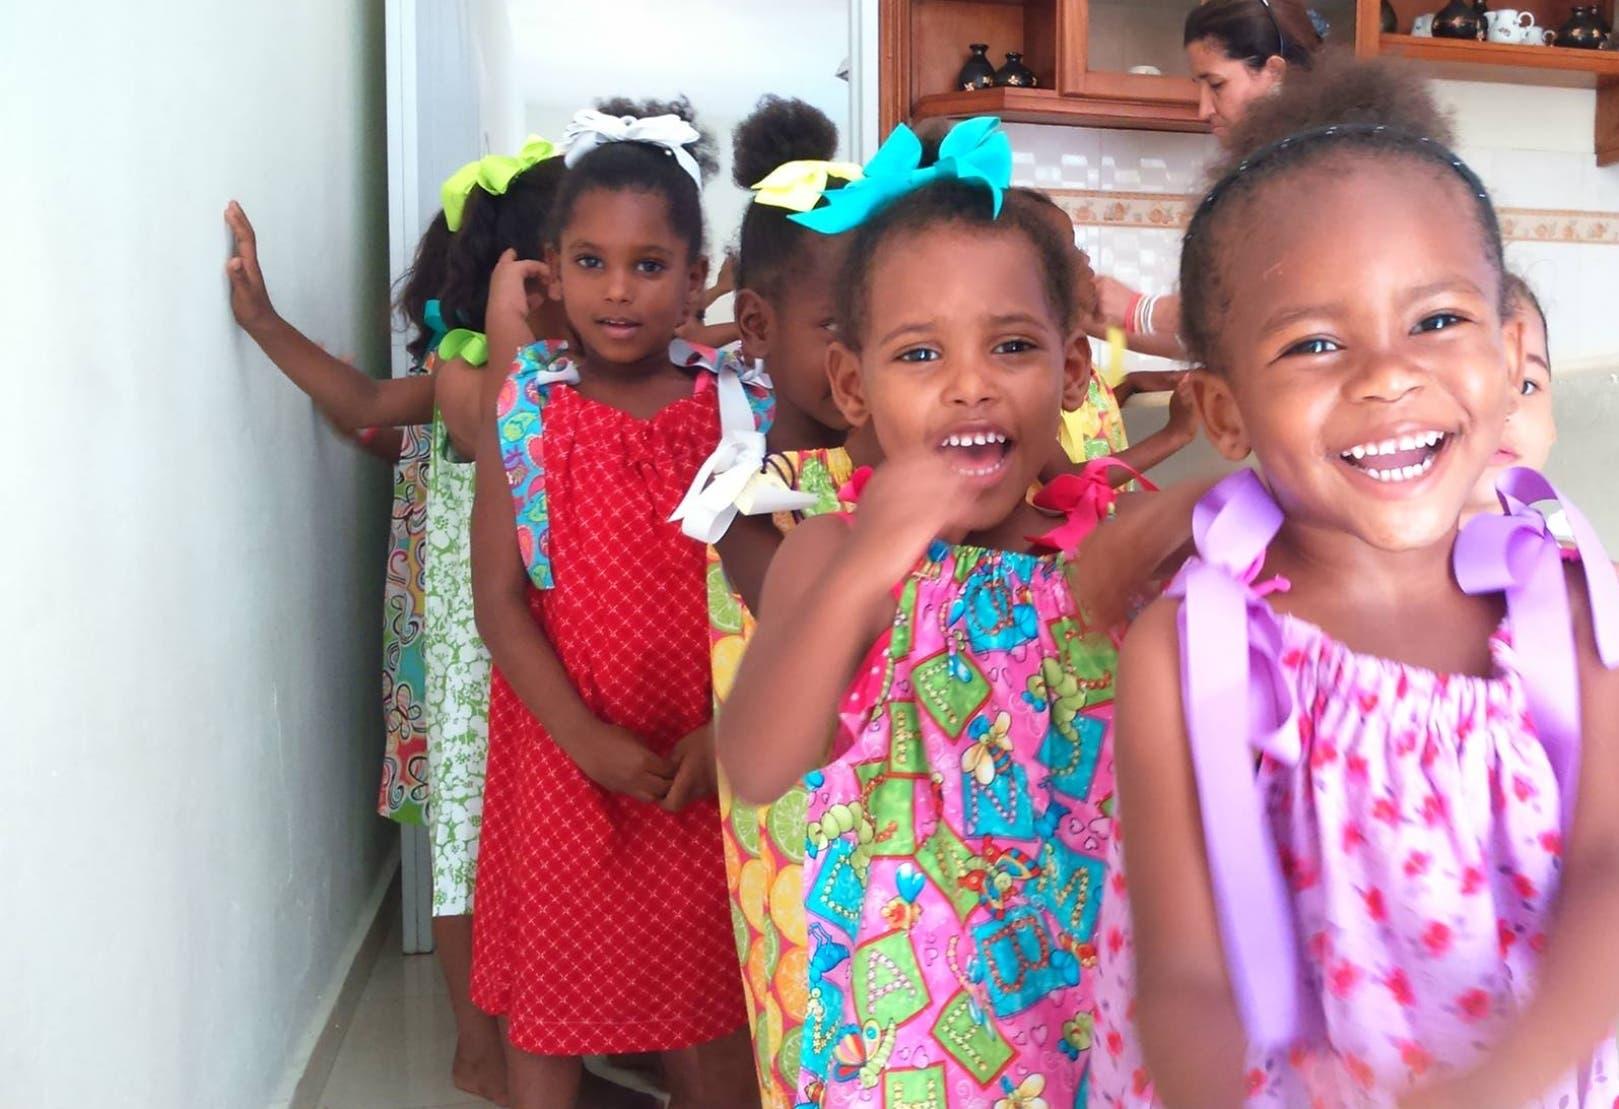 Madelaes, un lugar especial para niñas huérfanas